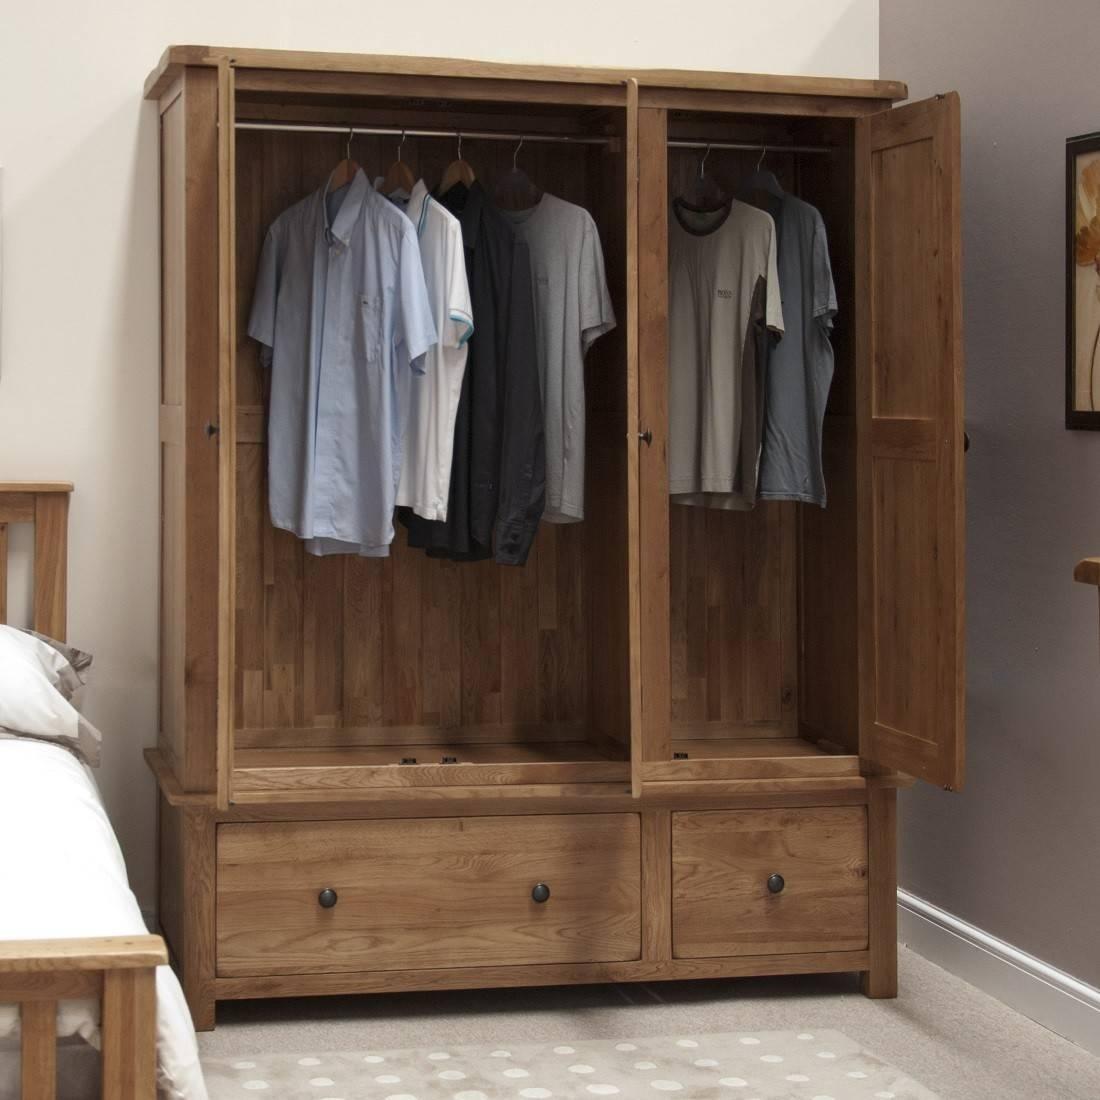 Rustic Solid Oak 3 Door Triple Wardrobe | Oak Furniture Uk in Oak 3 Door Wardrobes (Image 11 of 15)